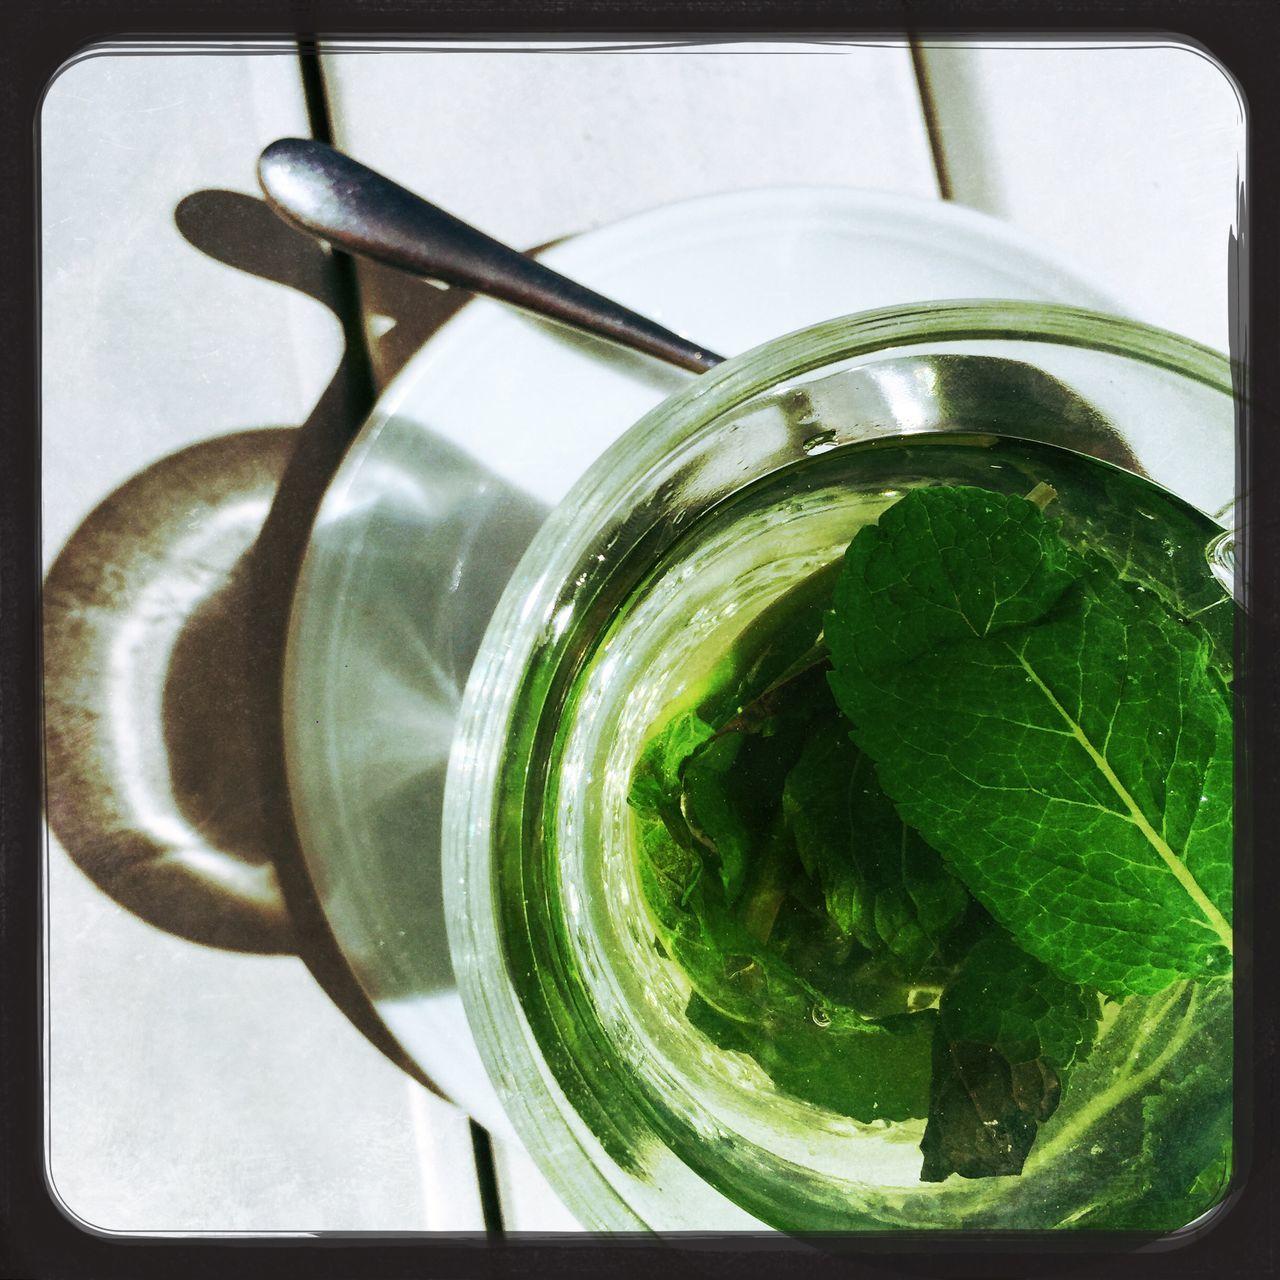 It's Tea Time... Hipstamatic Eye4photograghy Mobilephotography Shootermag Grryo